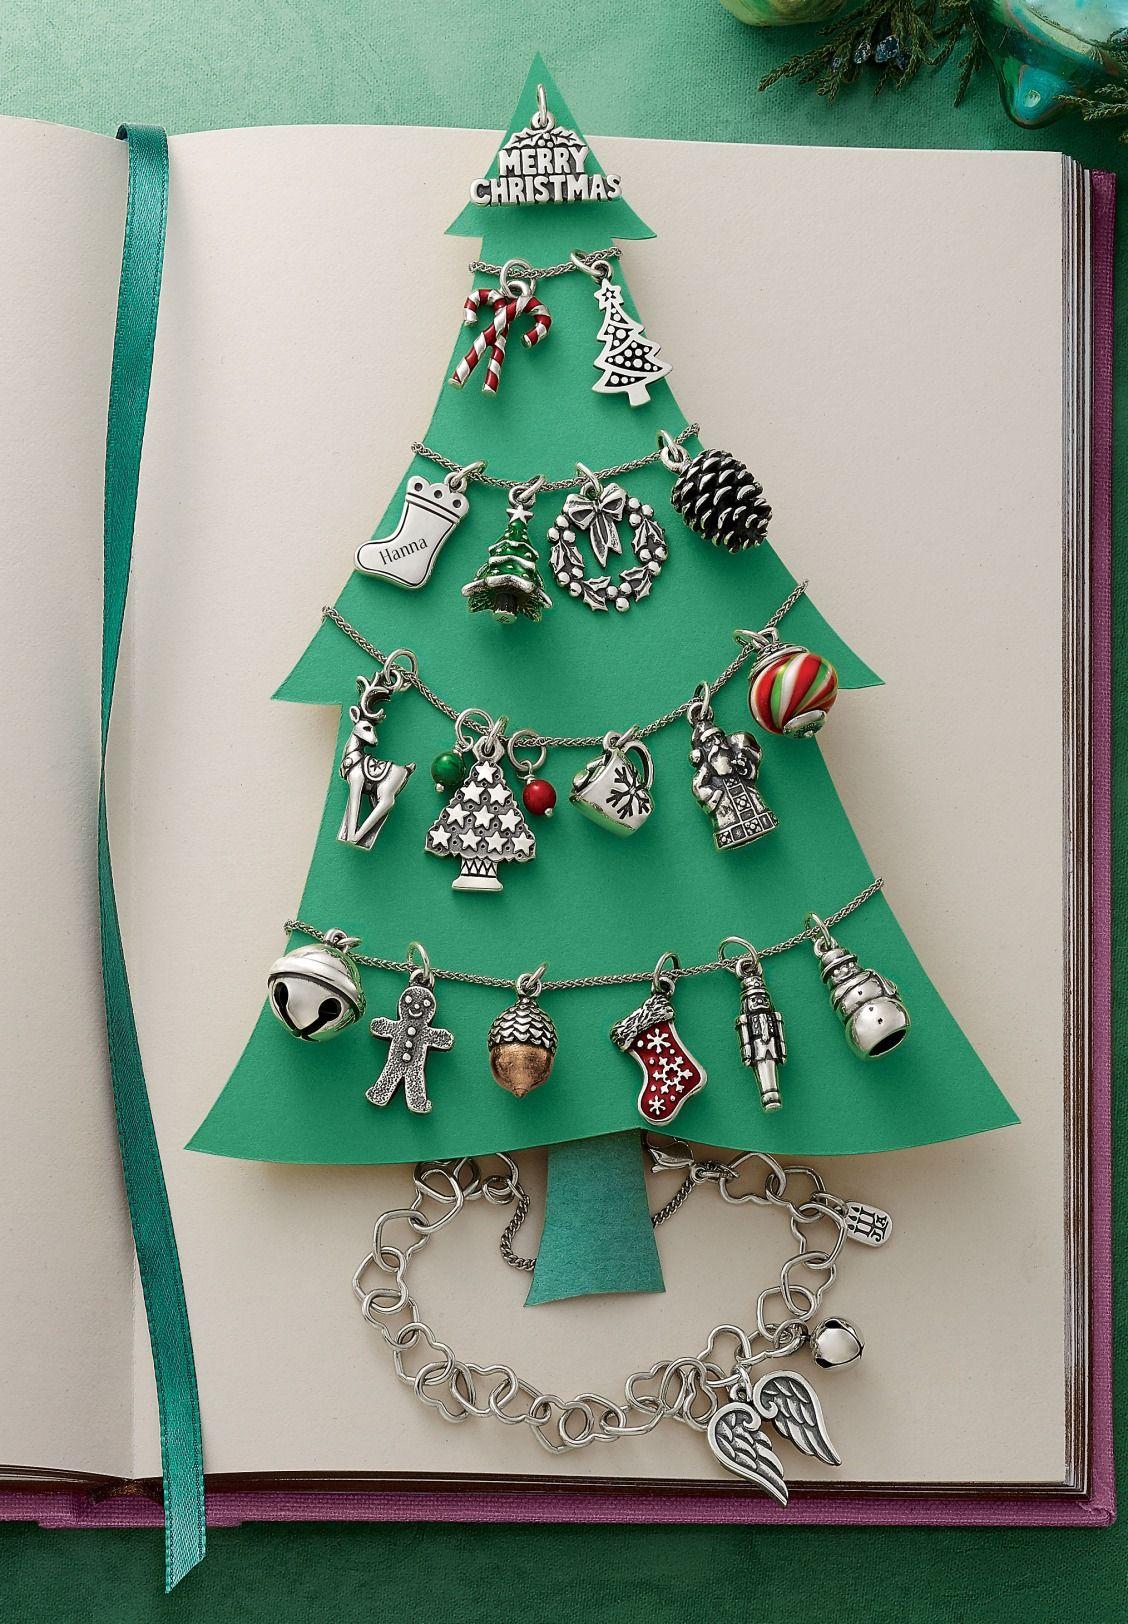 Charm Christmas tree pendant gold jewel Ornament necklace Symbol